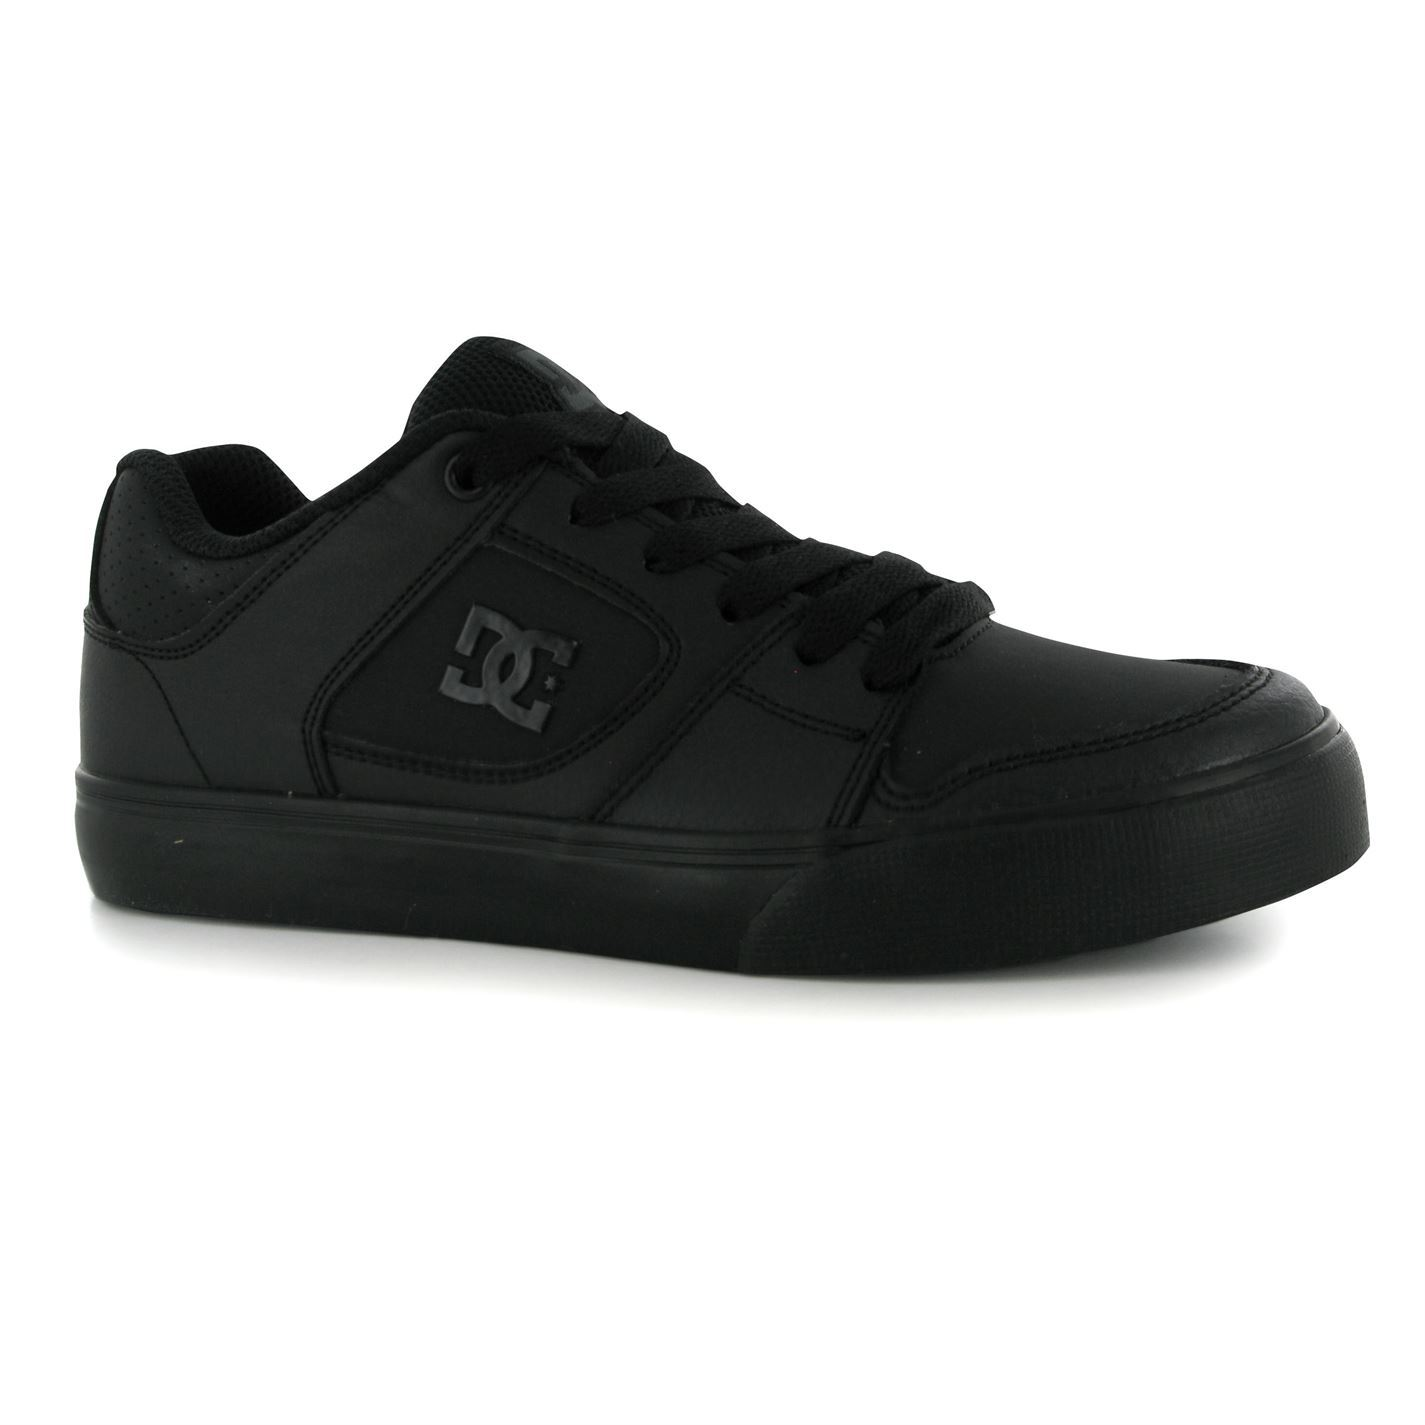 Skate shoes dc - Dc Shoes Blitz Skate Shoes Junior Boys Black Trainers Sneakers Footwear